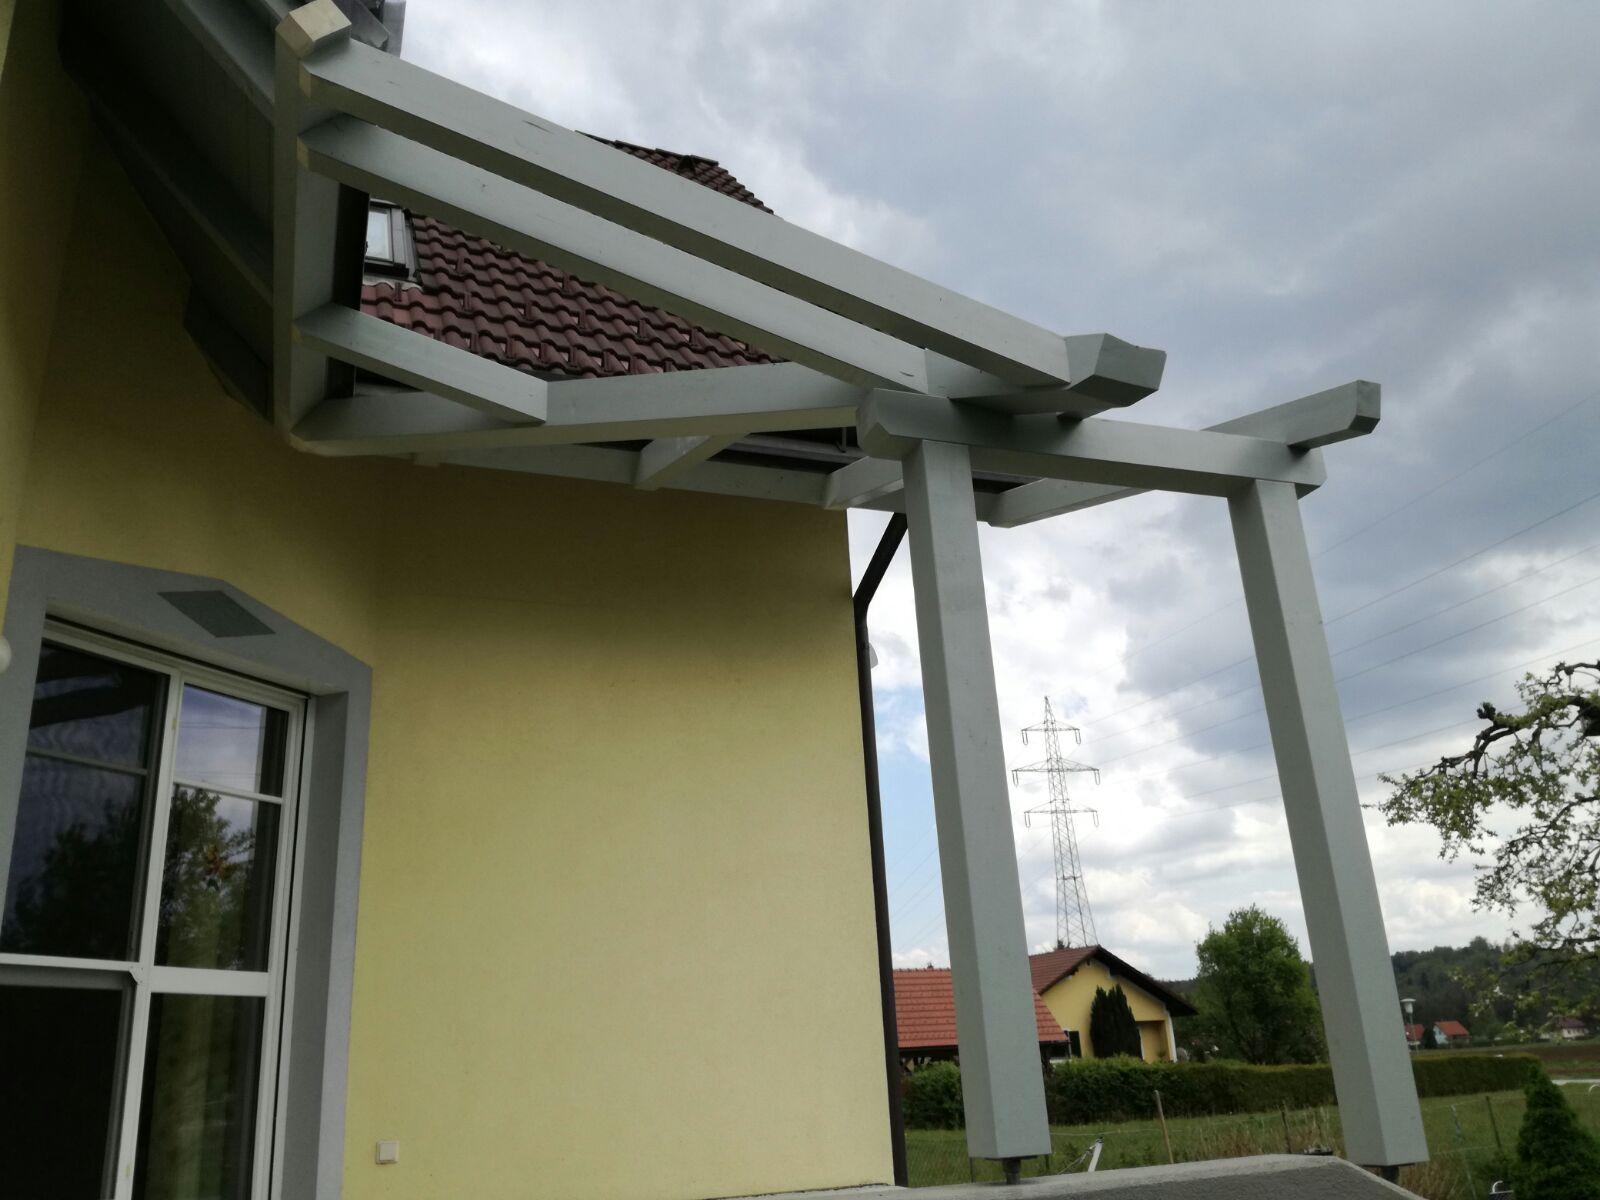 Terrassenüˆberdachung füˆr ein Glasdach